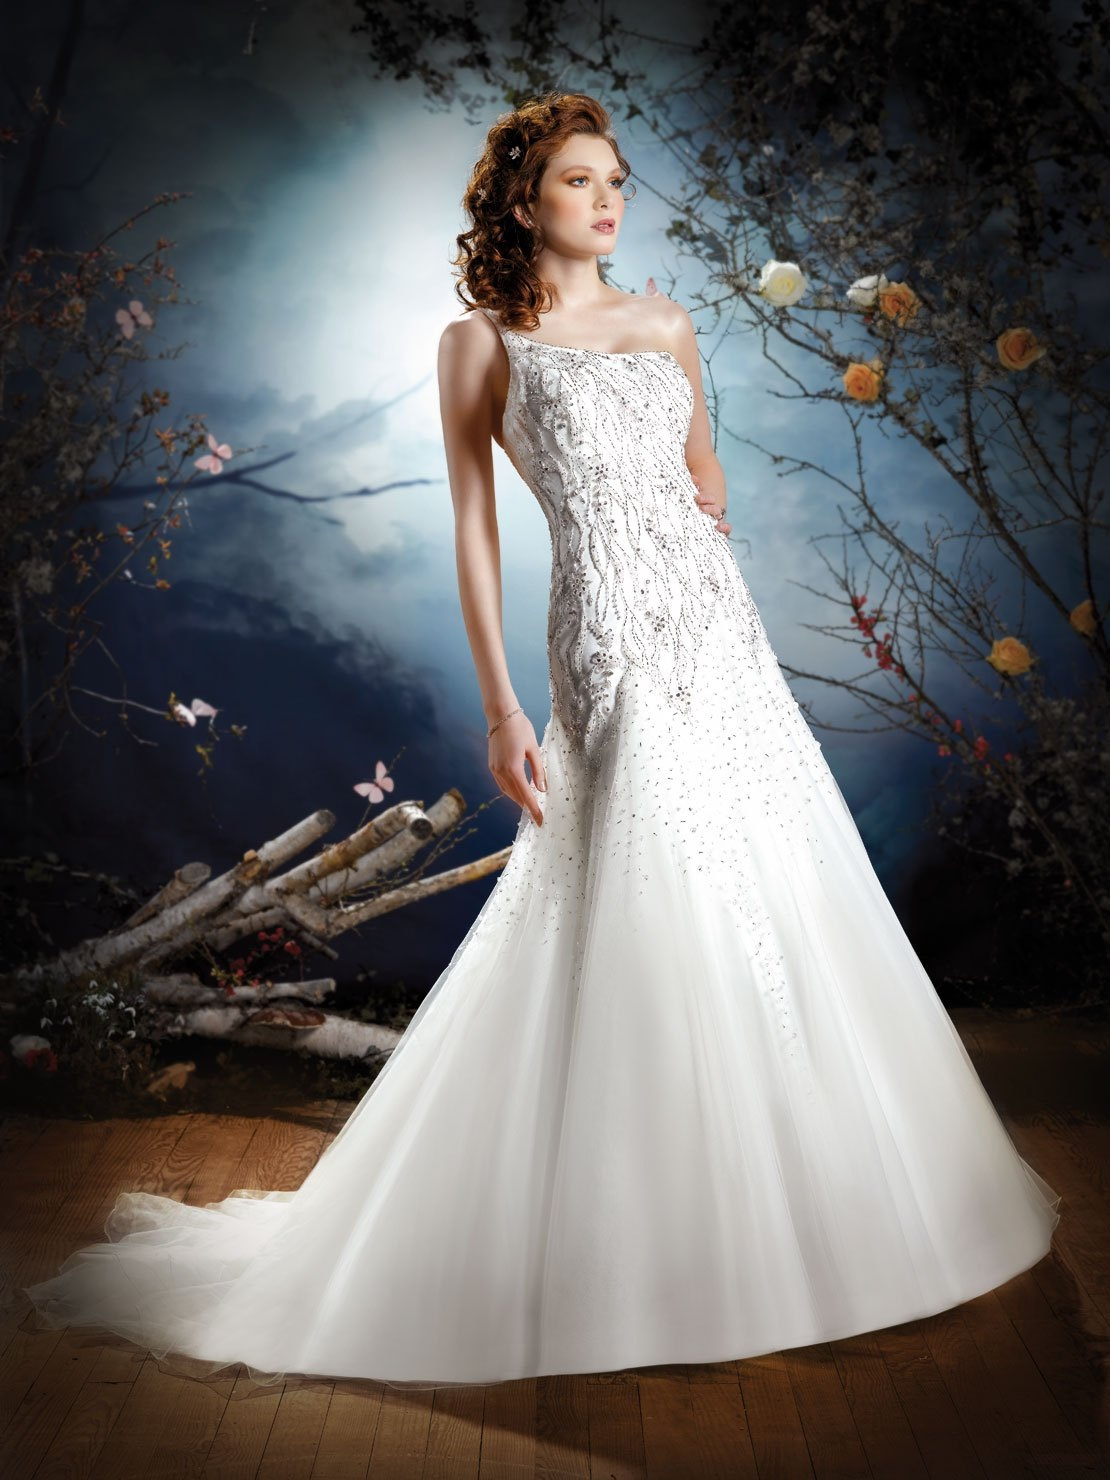 Kelly Star 2013 Spring Bridal Wedding Dresses World Of Bridal - Star Wedding Dress